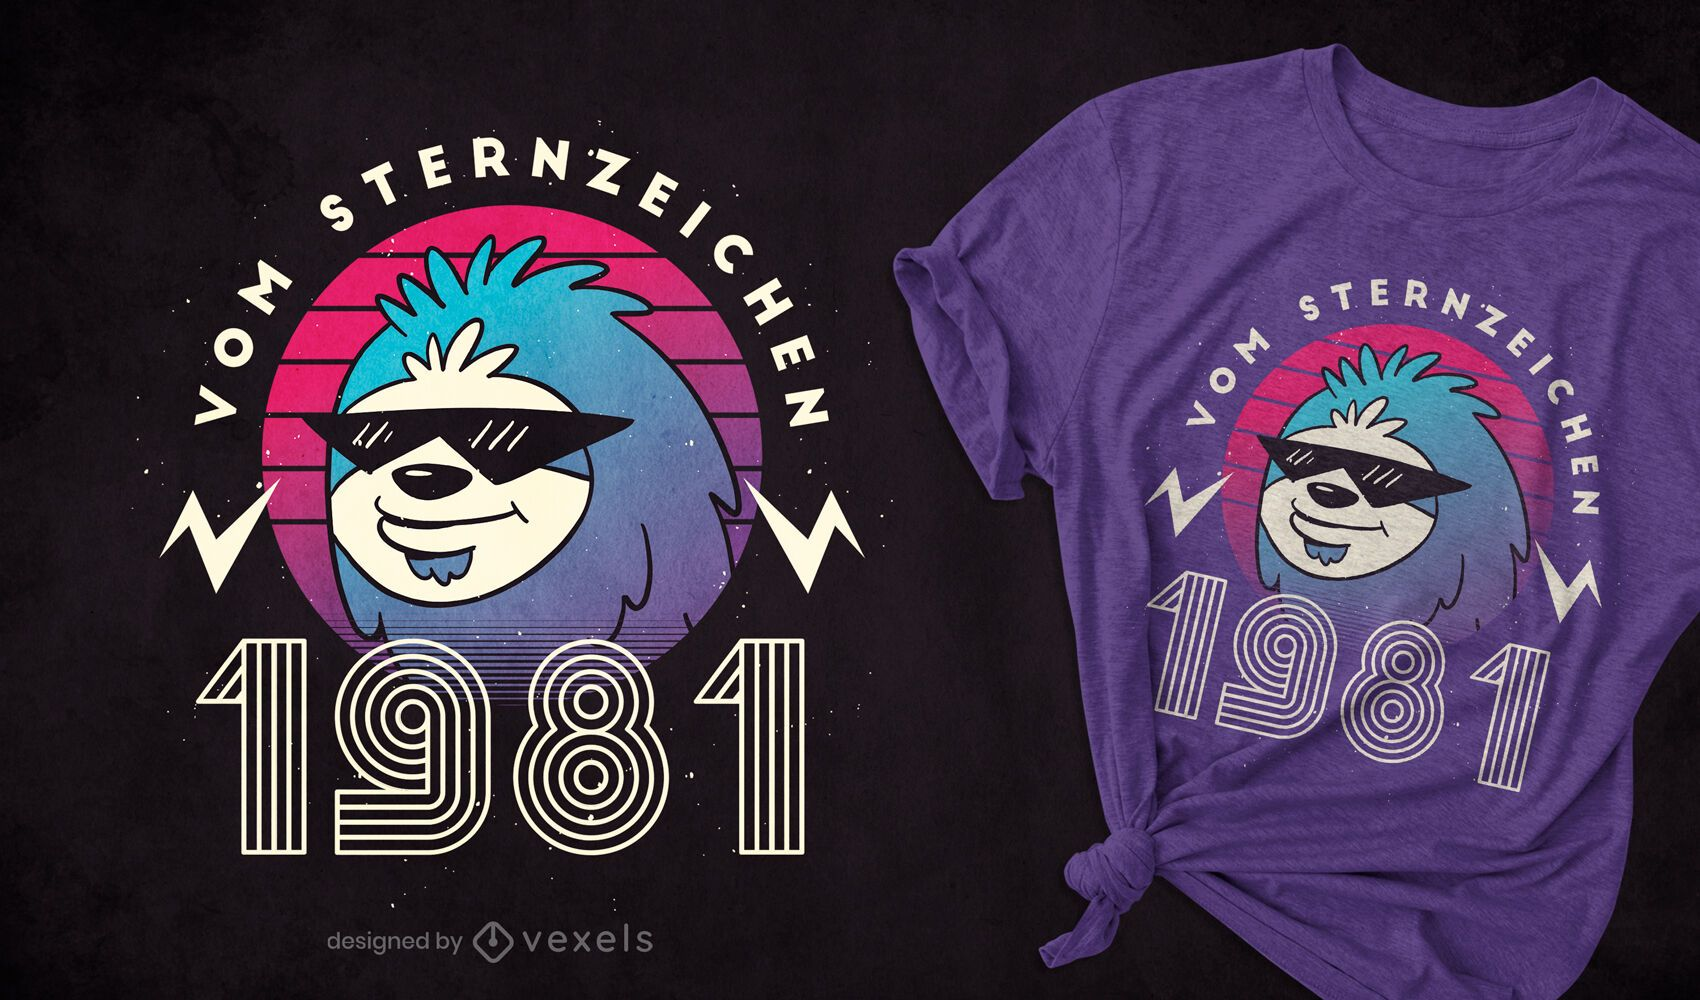 Sloth 1981 t-shirt design